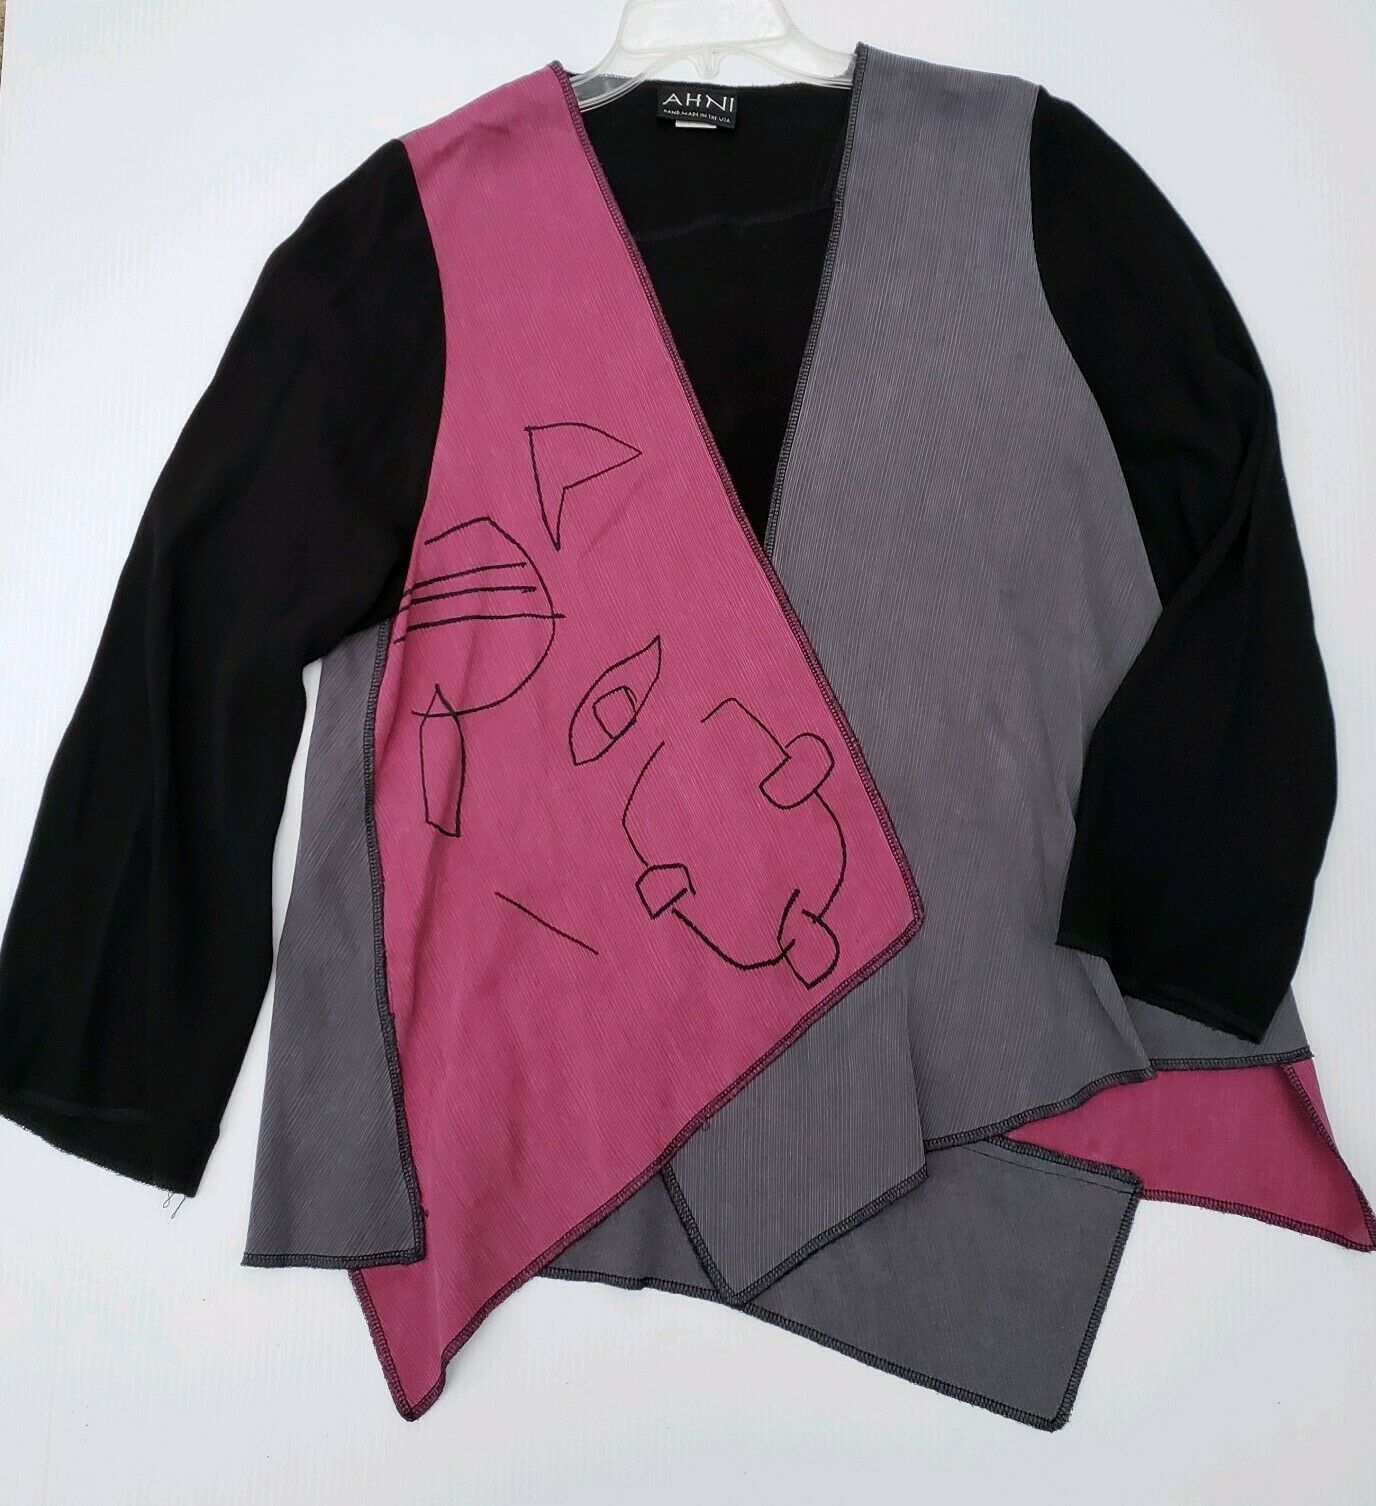 AHNI Größe 1 Farbeblock Contrast Panels Tunic Top Art to Wear Lagenlook